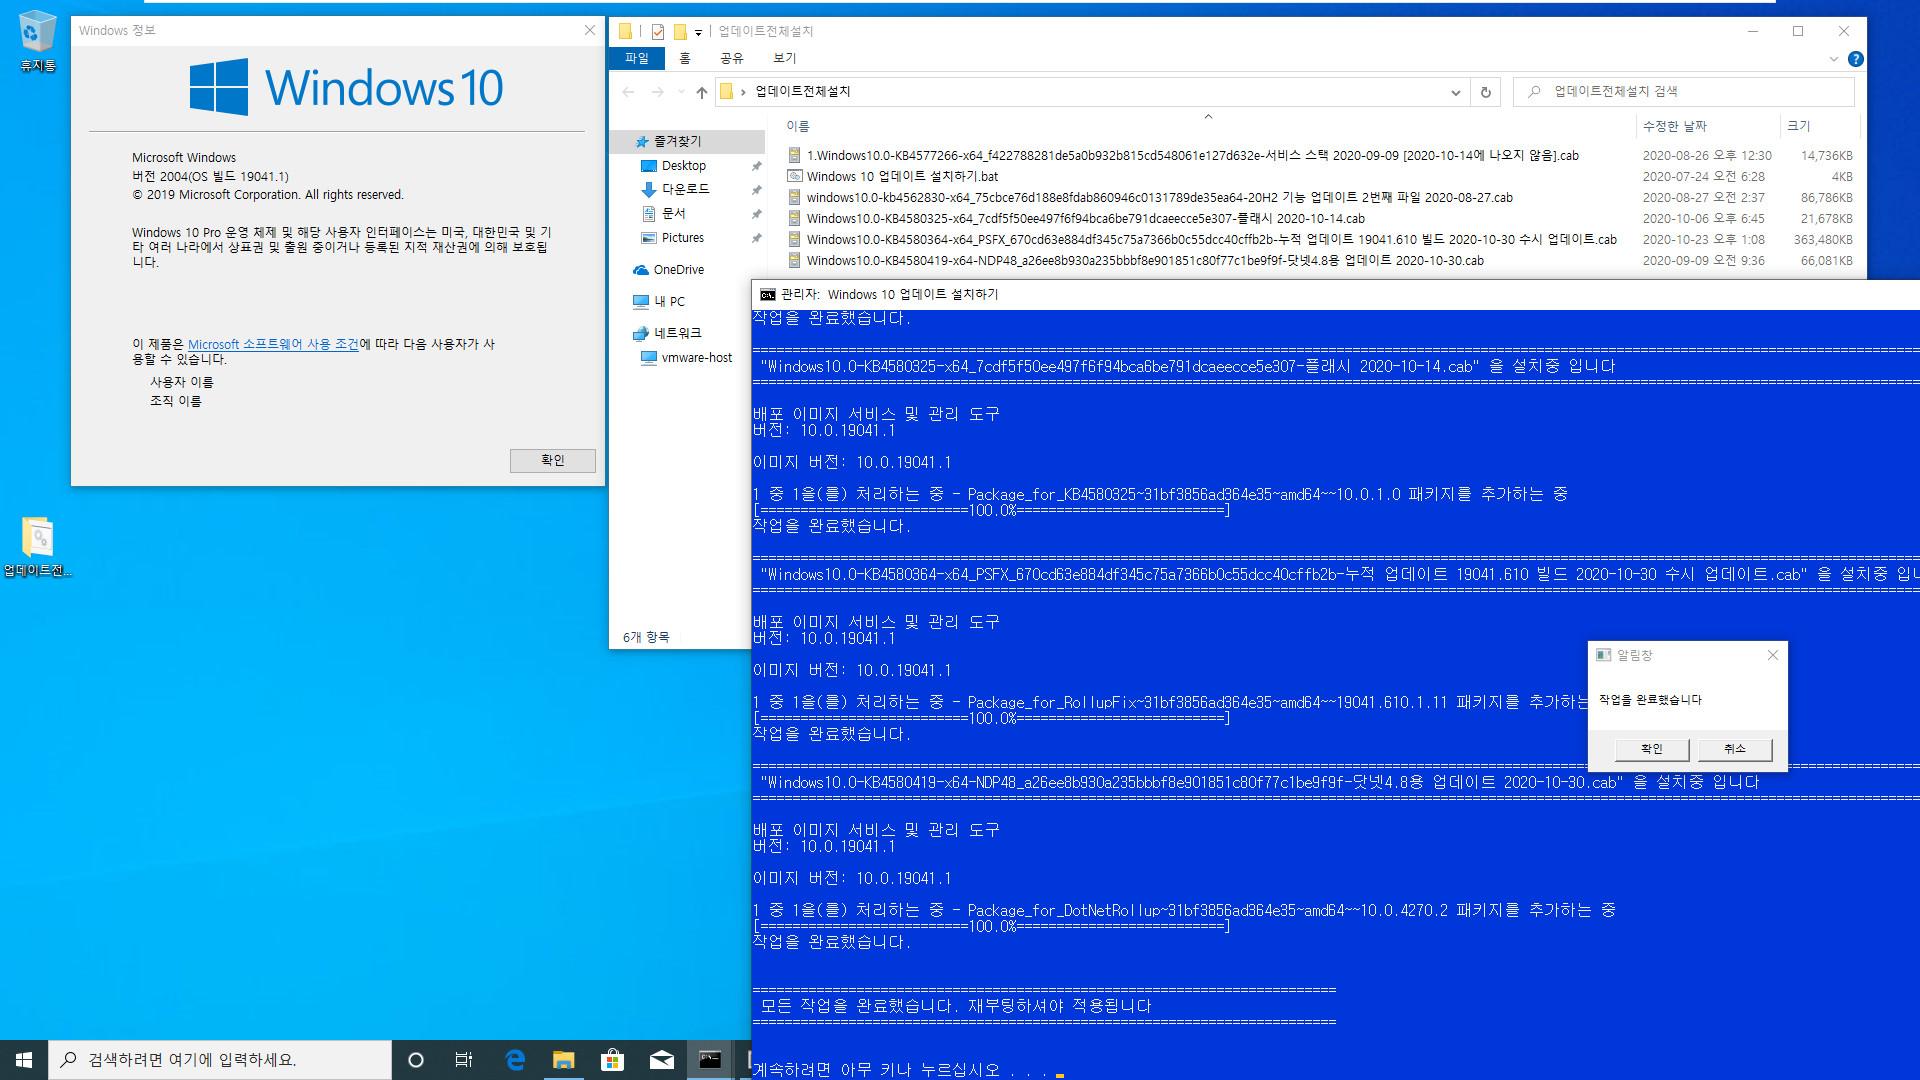 Windows 10 업데이트 설치하기.bat 으로 일괄 설치하기 - 서비스 스택 업데이트만 앞에 1 붙여서 먼저 설치되게 하면 전부 설치됩니다 2020-10-31_114045.jpg